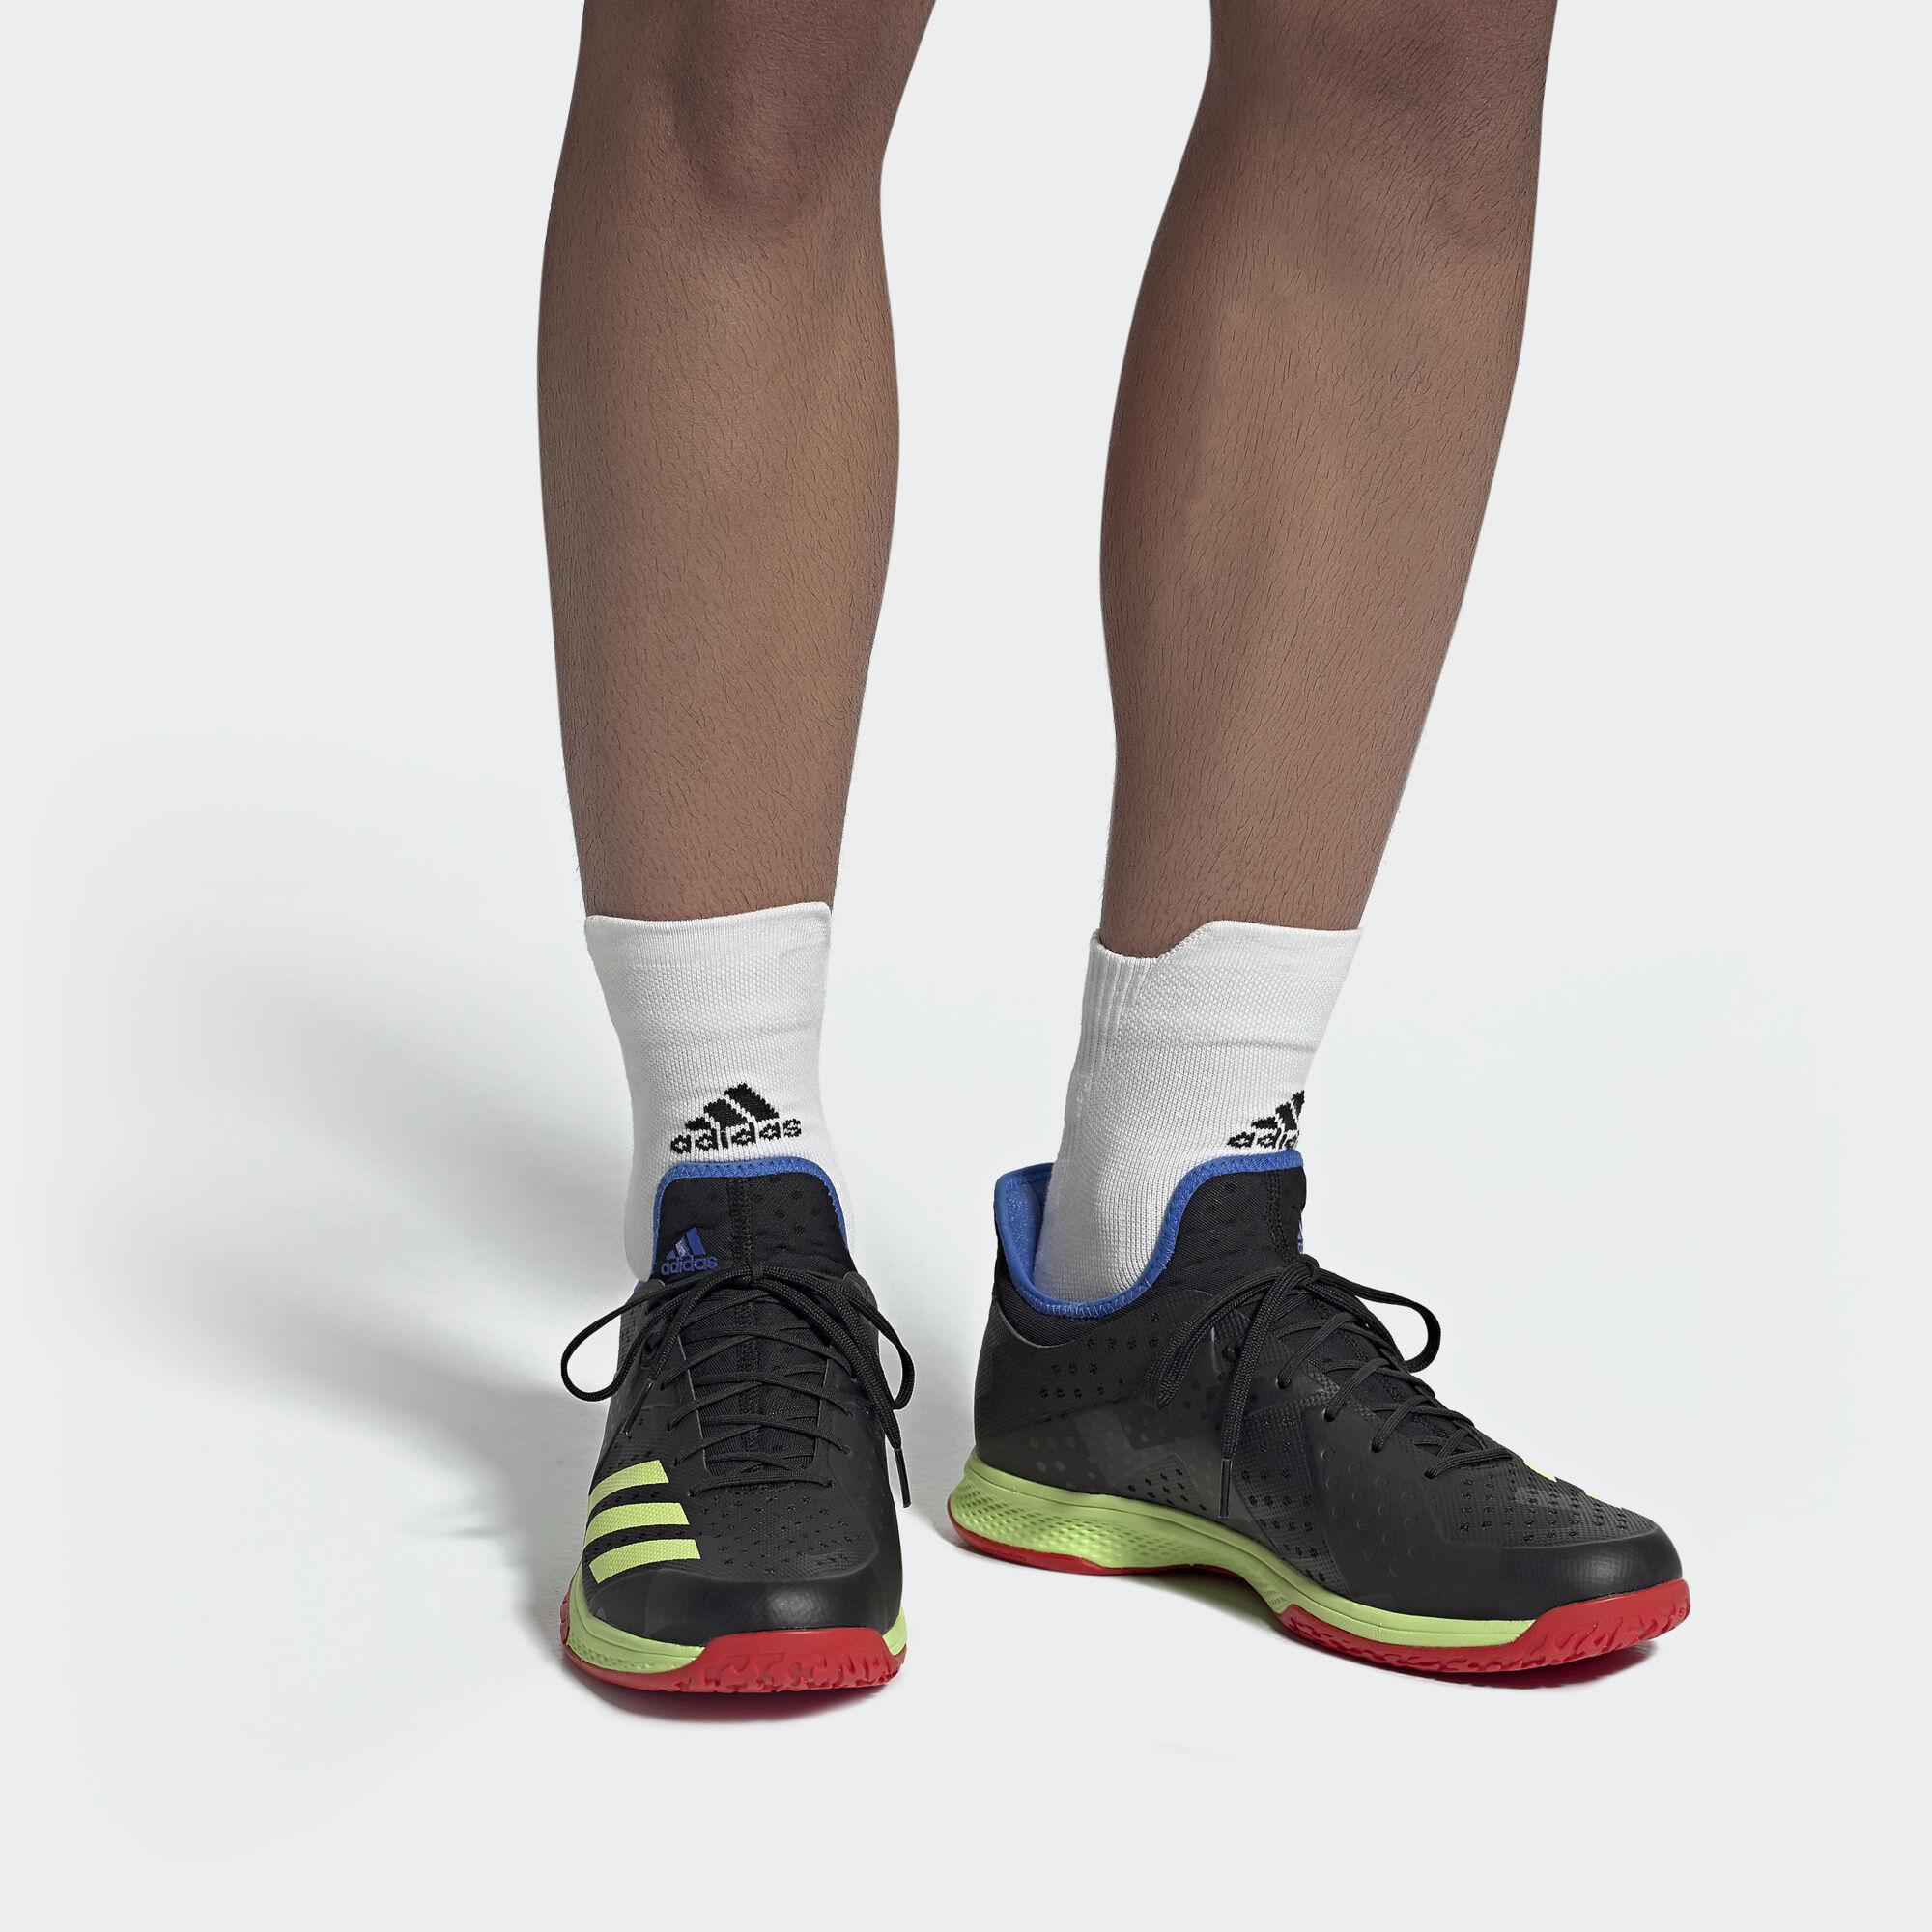 finest selection 94c5d a2742 adidas Counterblast Bounce Schuh - weiß  adidas Deutschland